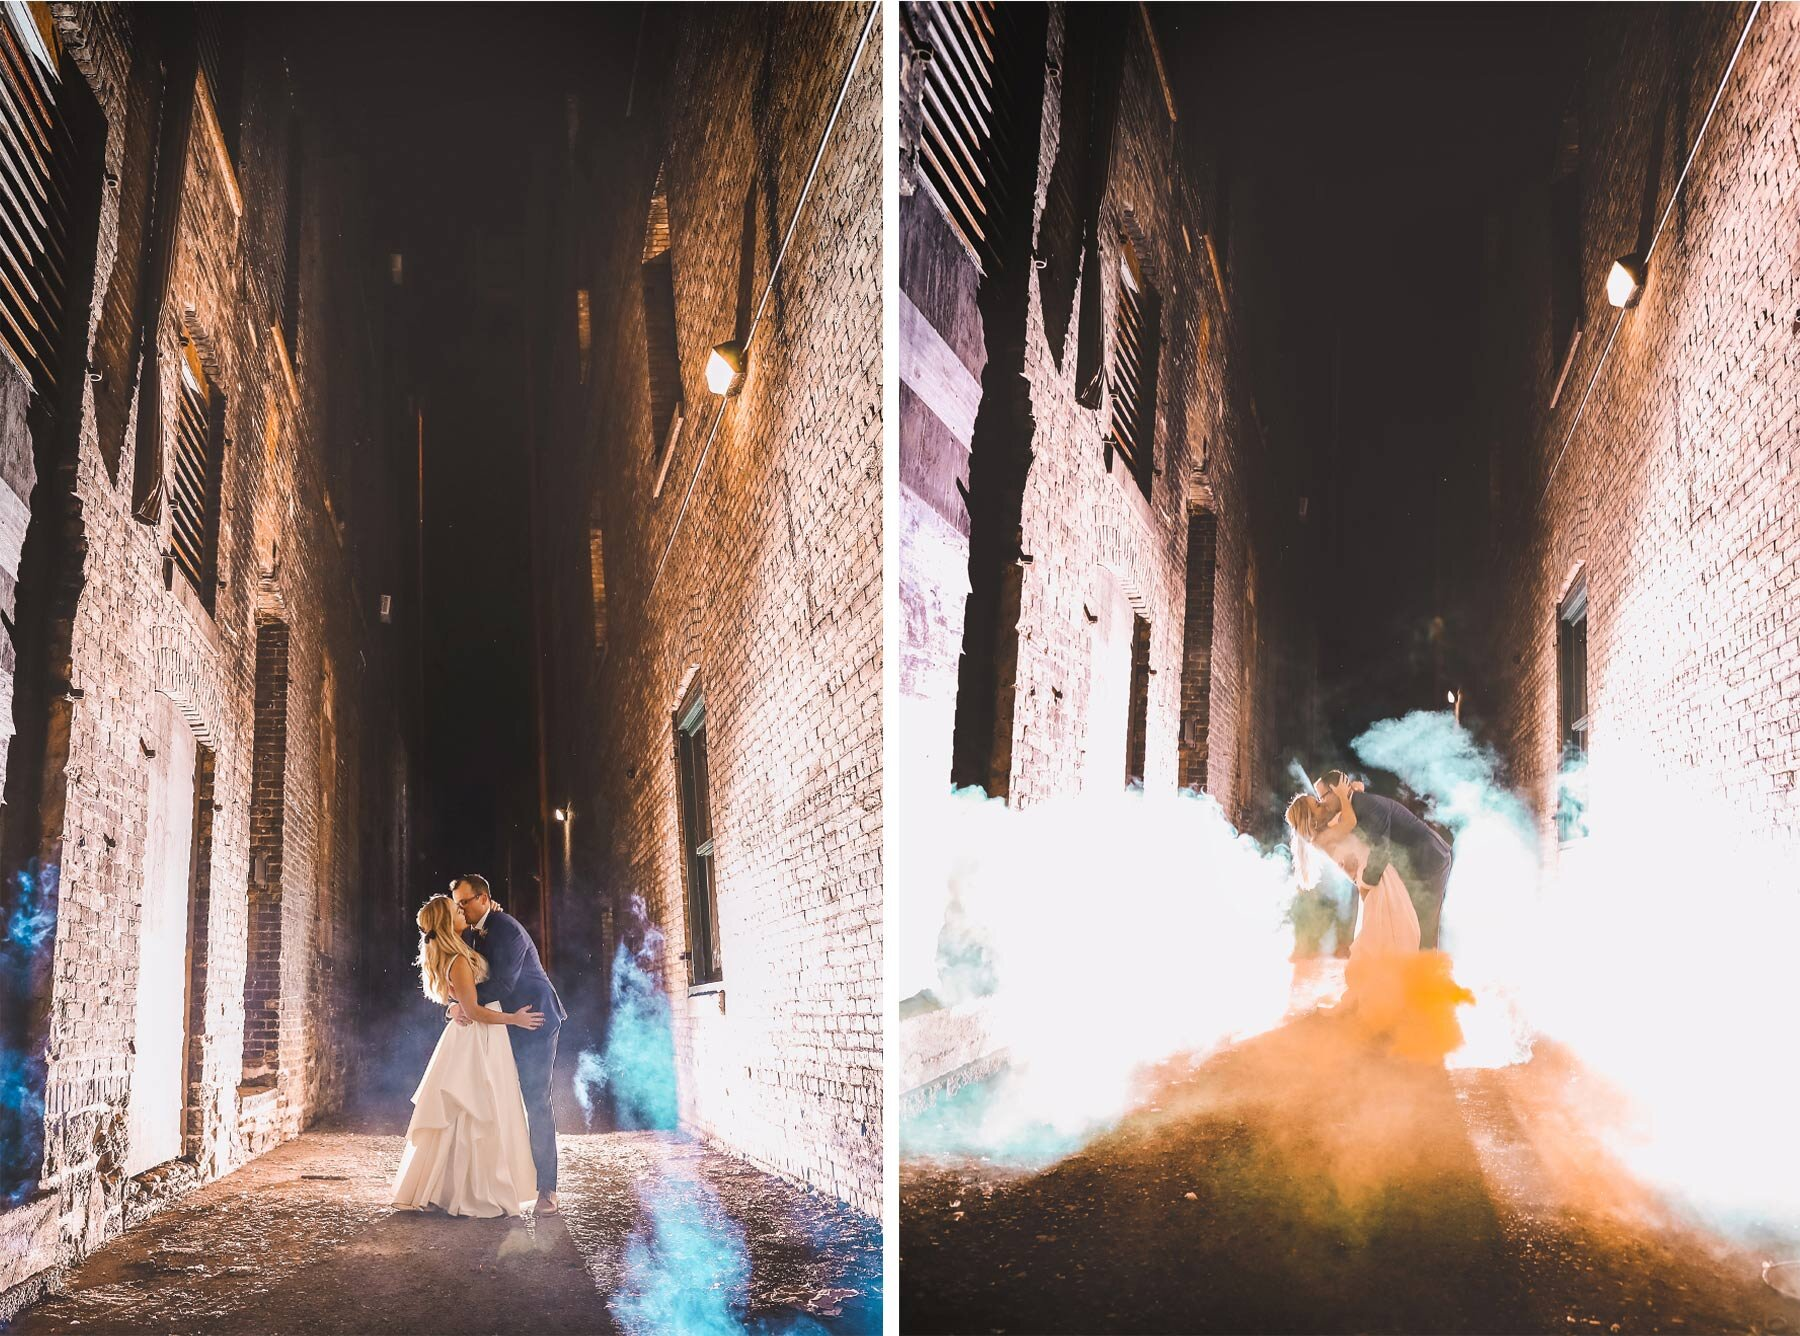 18-Vick-Photography-Wedding-Minneapolis-Minnesota-Downtown-Alley-Groom-Night-Smoke-Danielle-and-Tom.jpg